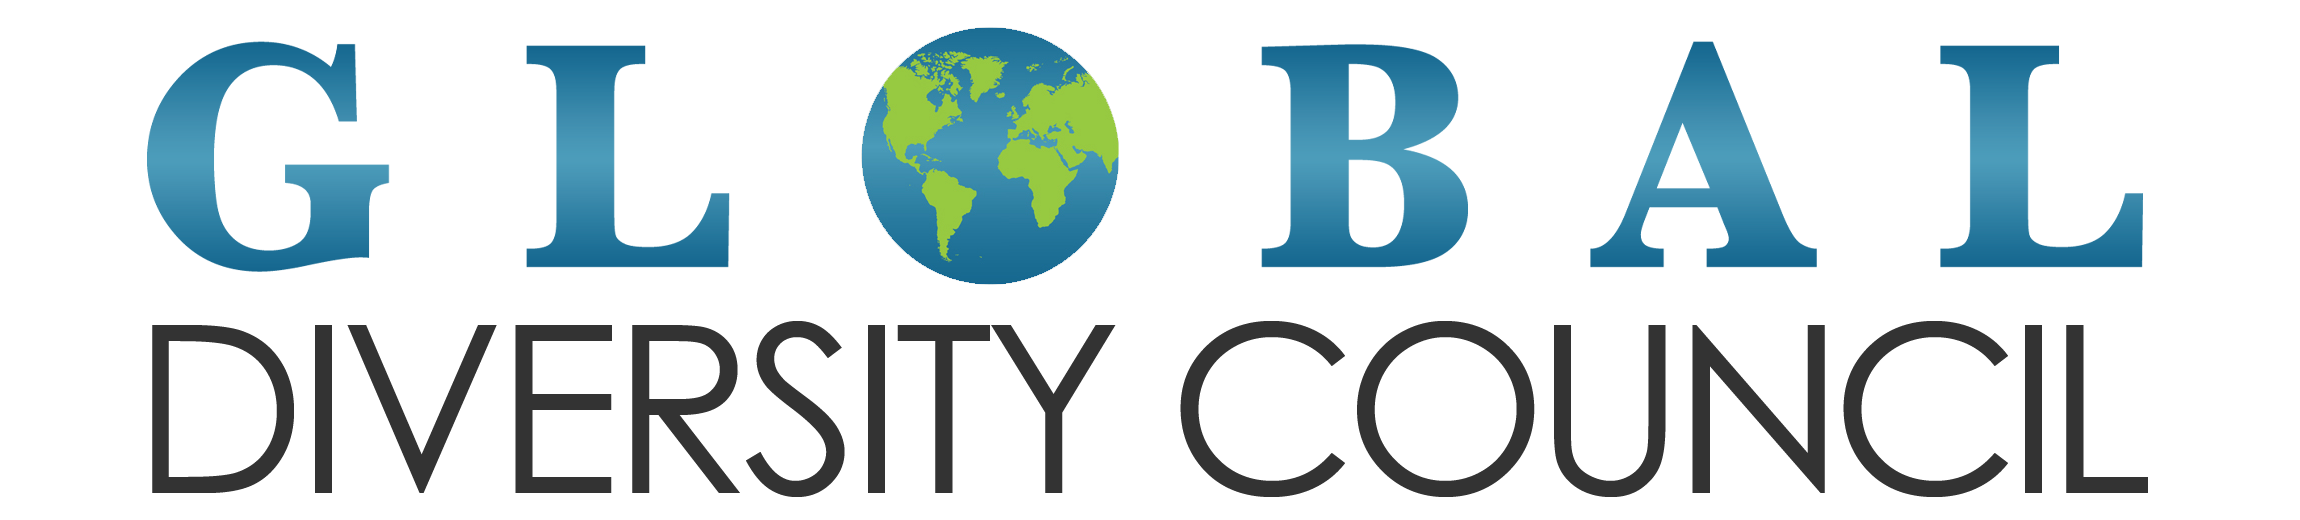 Global Diversity Council